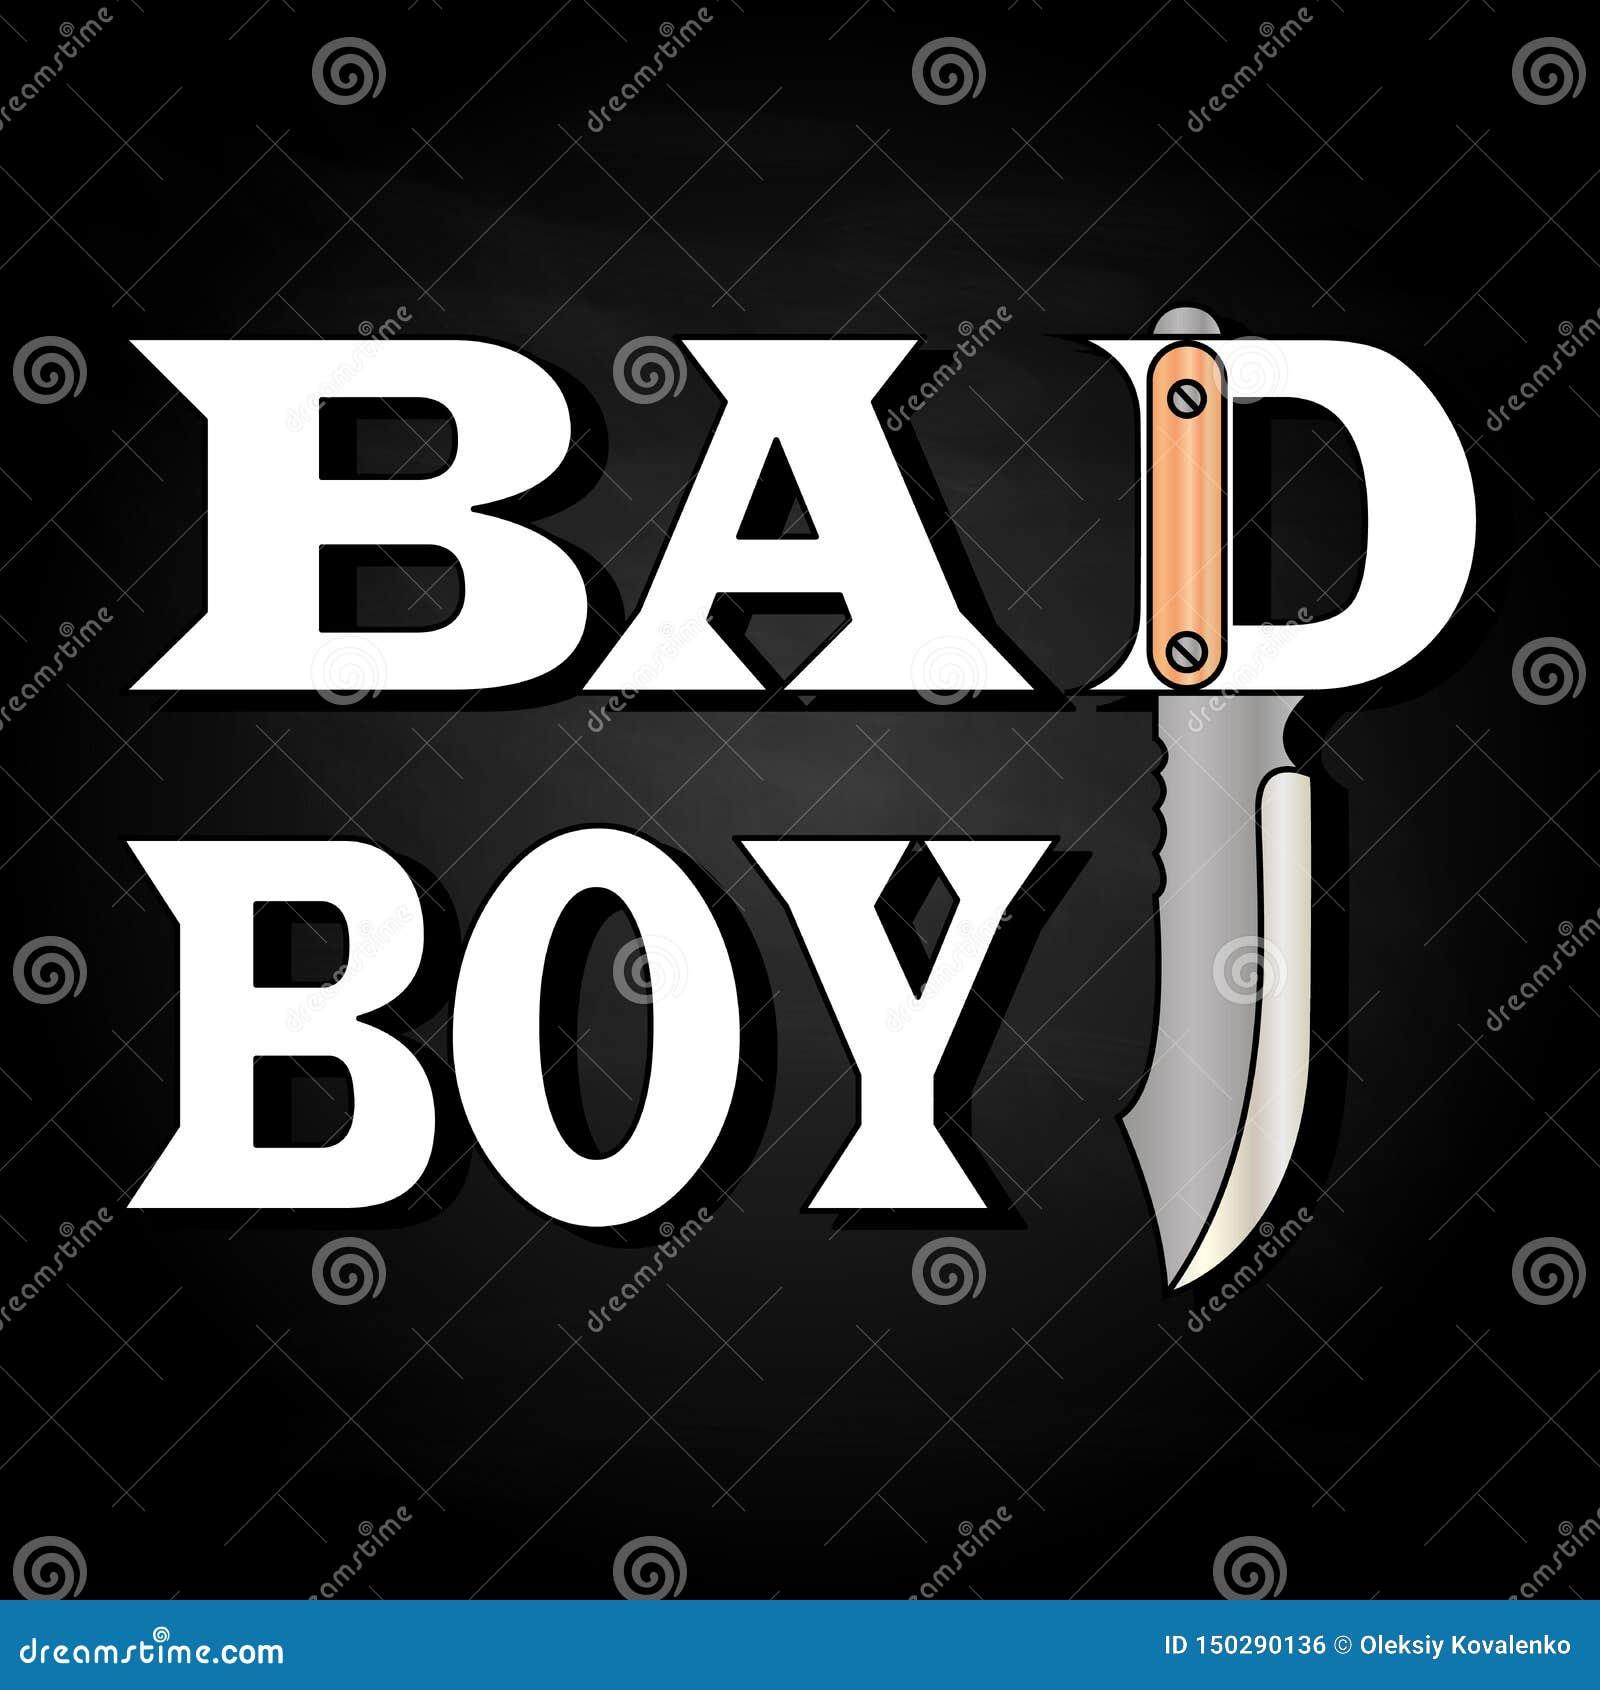 Bad boy images hd download